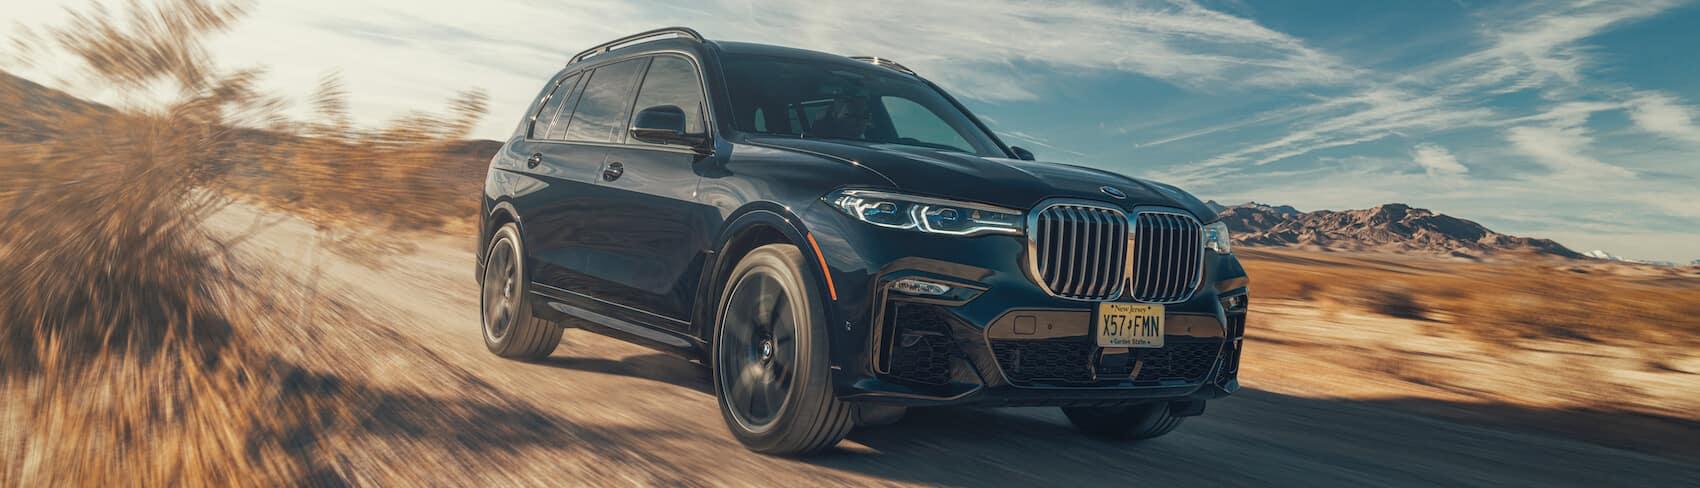 BMW X7 vs Mercedes-Benz GLE comparison Pensacola, FL